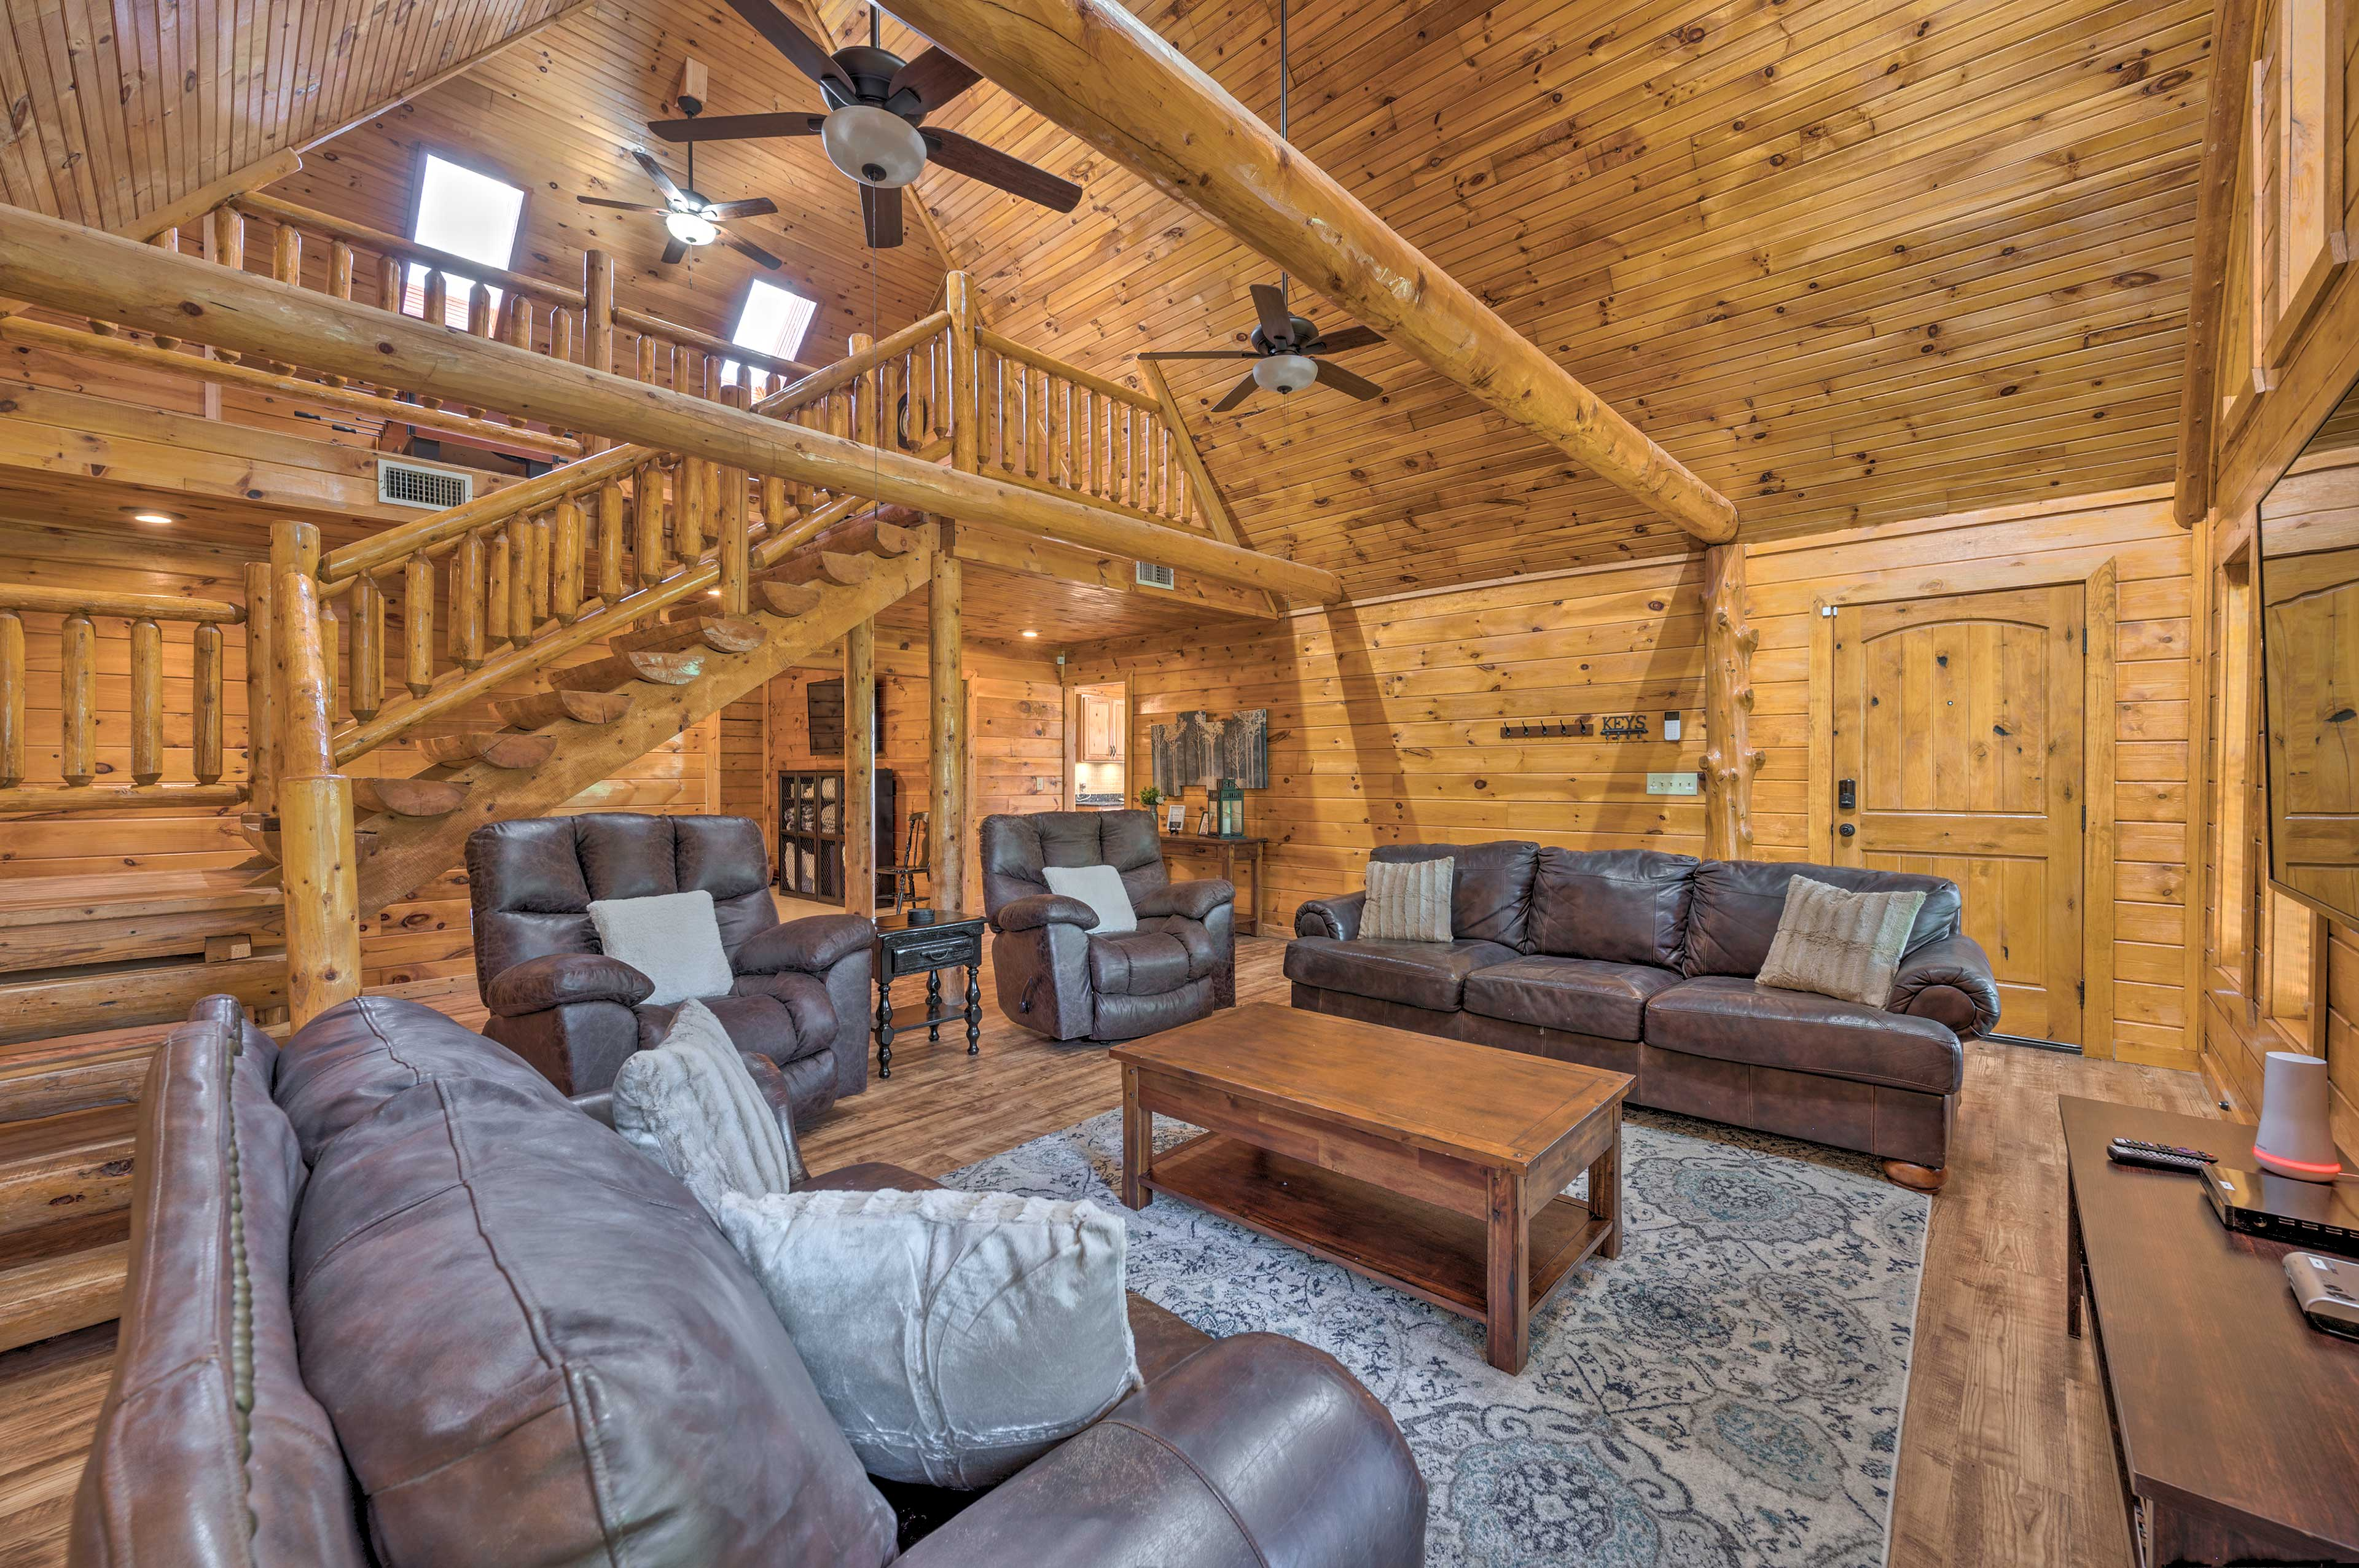 Broken Bow Vacation Rental   3BR   3.5BA   2,600 Sq Ft   2-Story Home